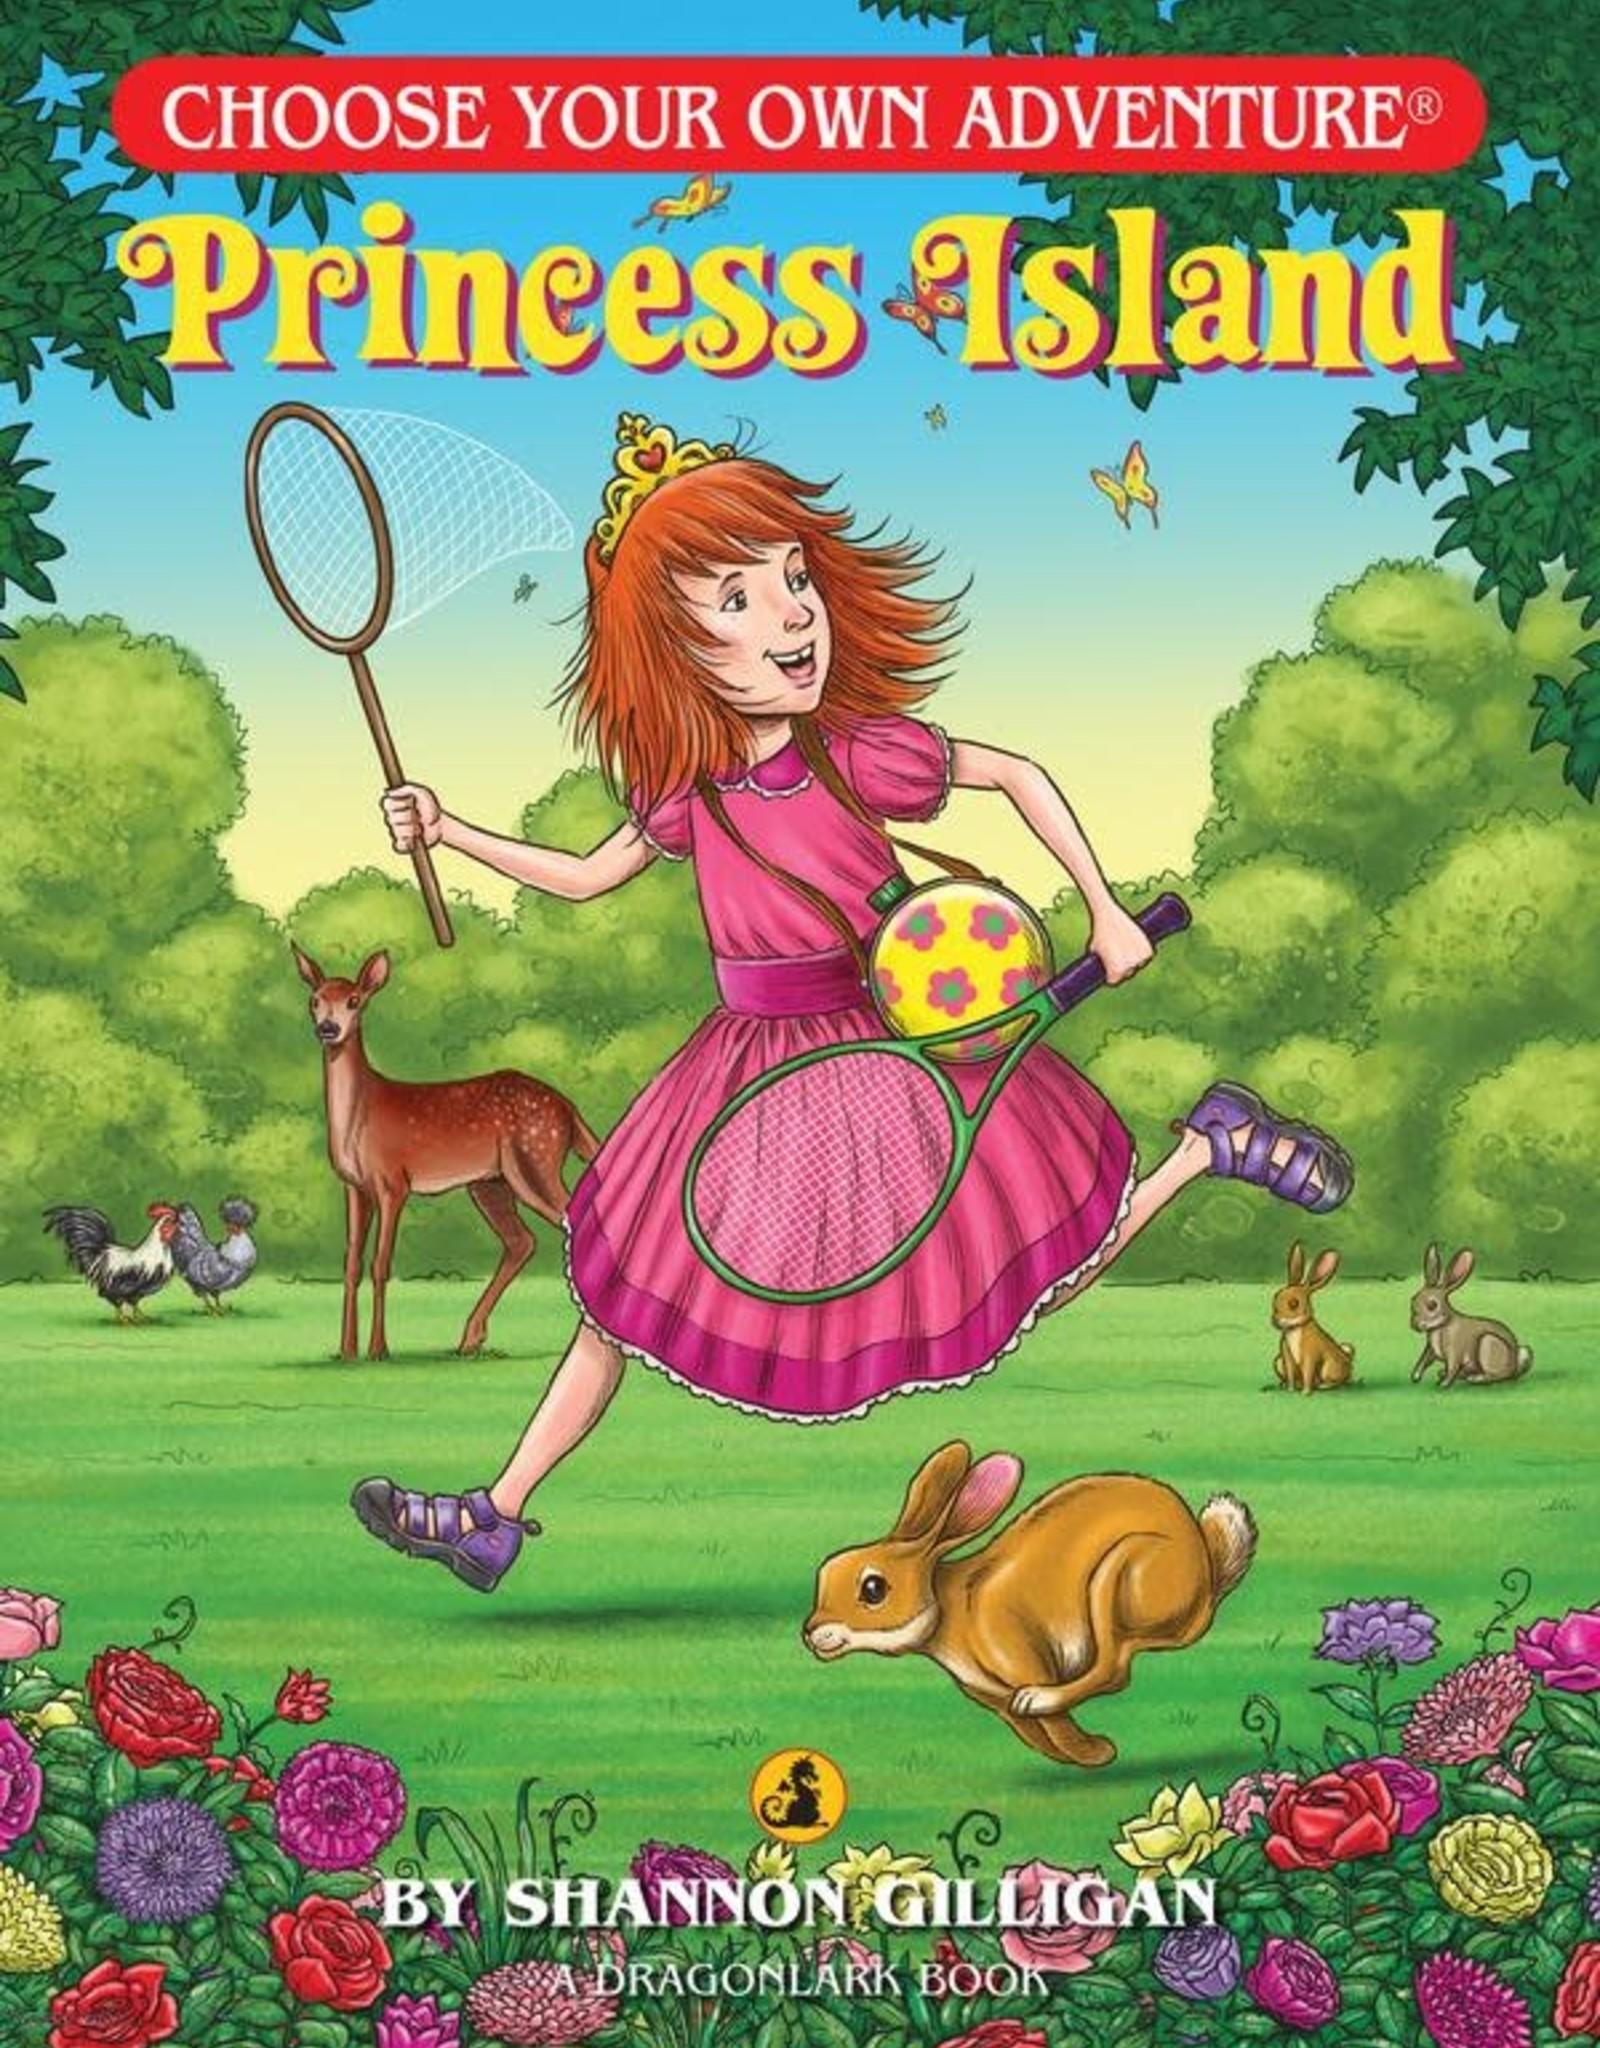 Choose Your Own Adventure CYOA Princess Island